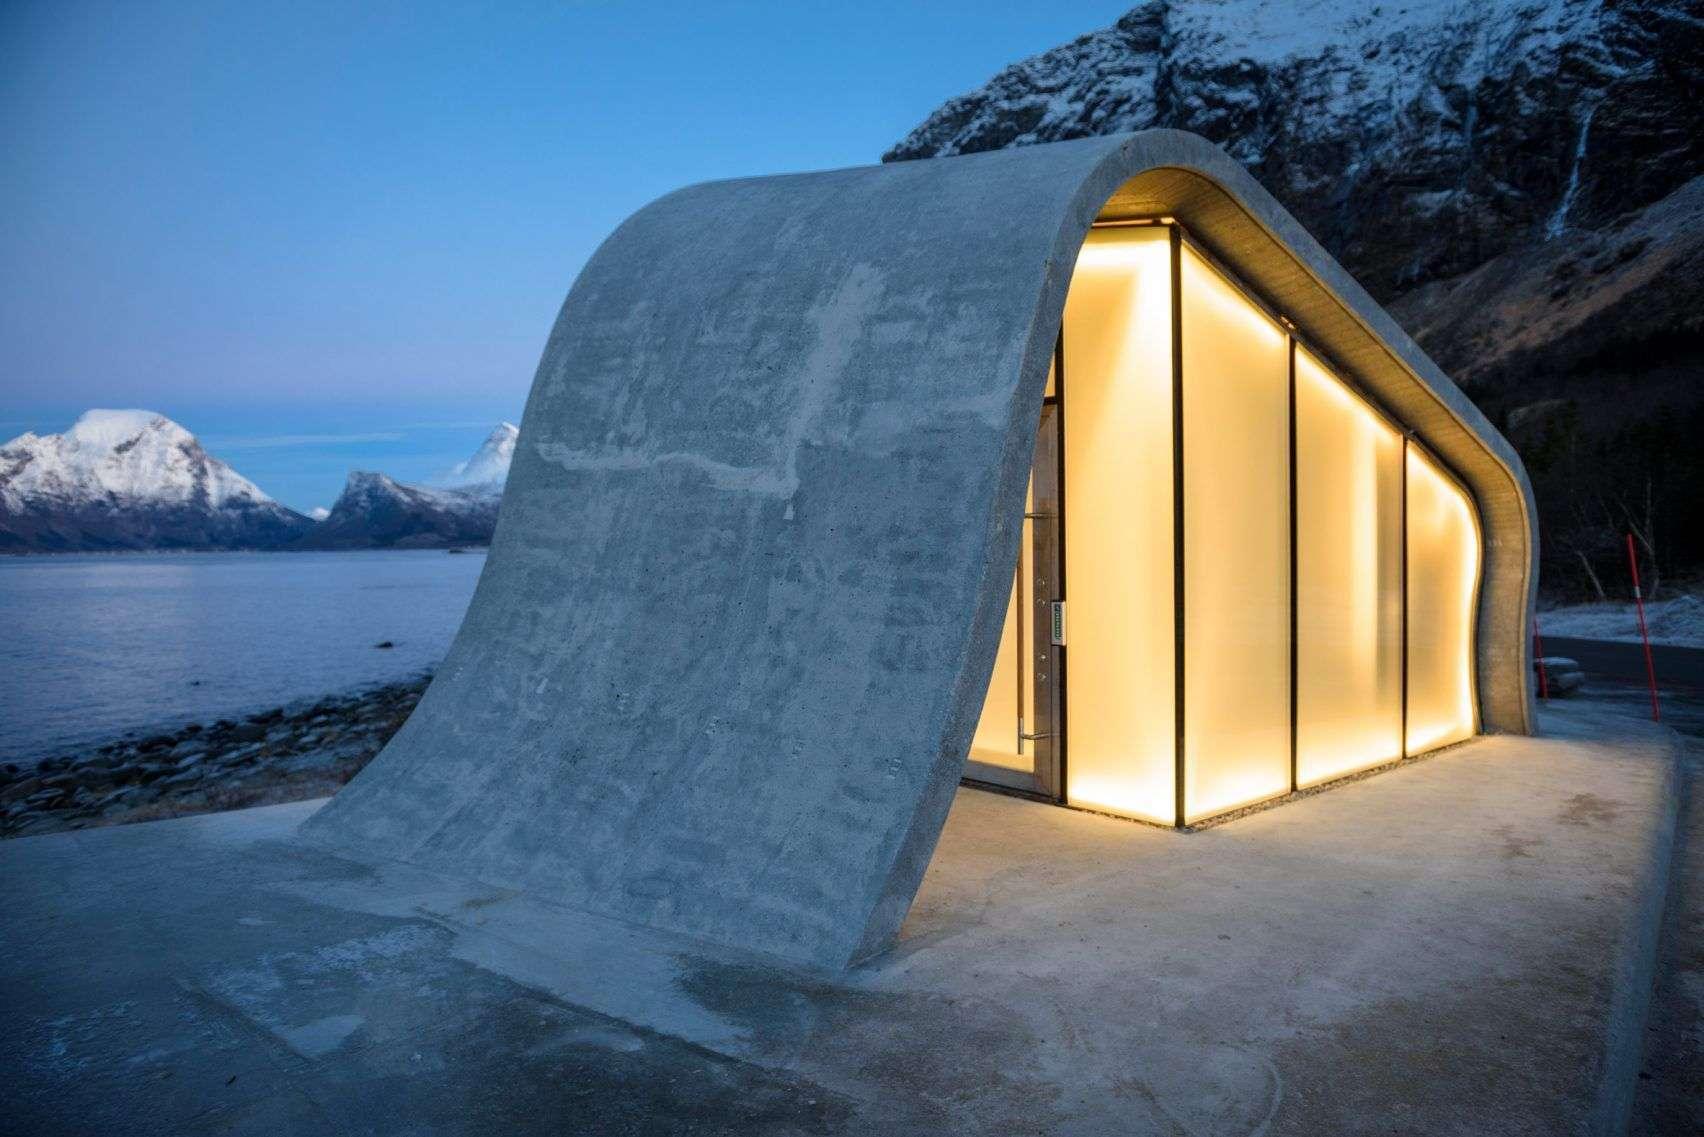 ureddplassen-norwegian-scenic-route-haugen-zohar-architecture-public-leisure_dezeen_2364_col_6-1704x1137